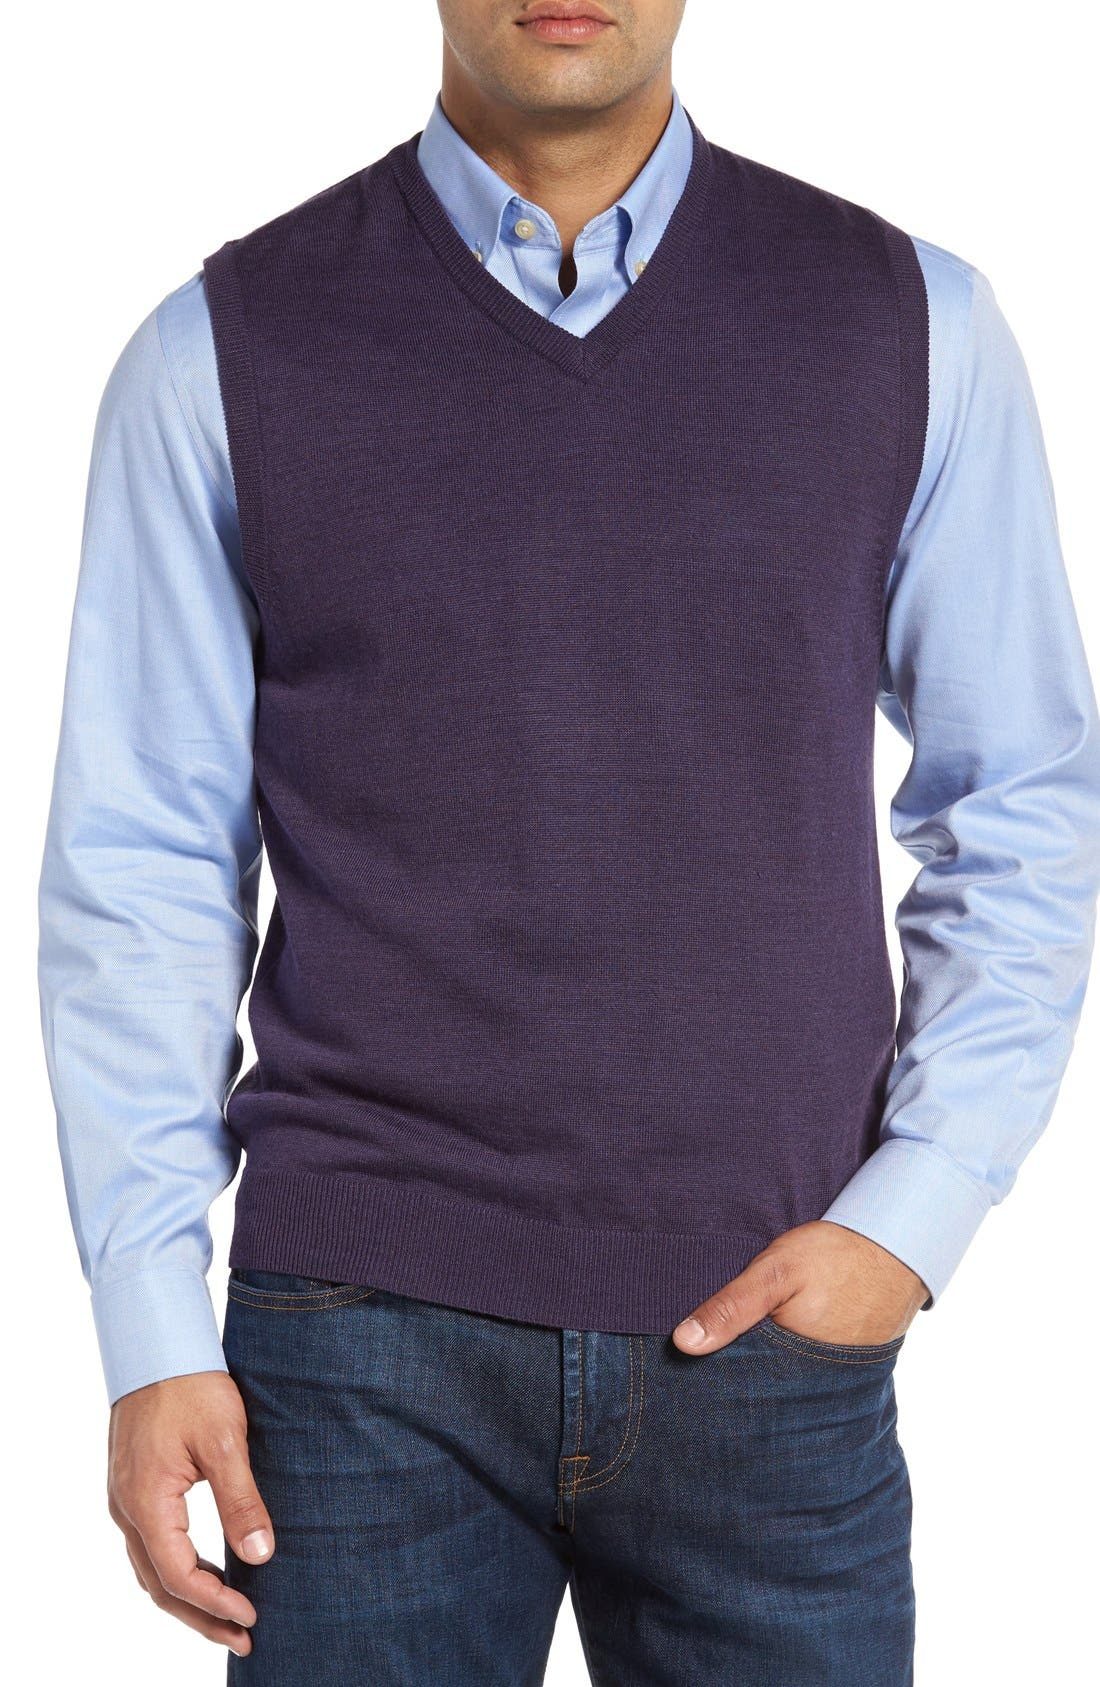 Alternate Image 1 Selected - Cutter & Buck 'Douglas' Merino Wool Blend V-Neck Sweater Vest (Online Only)